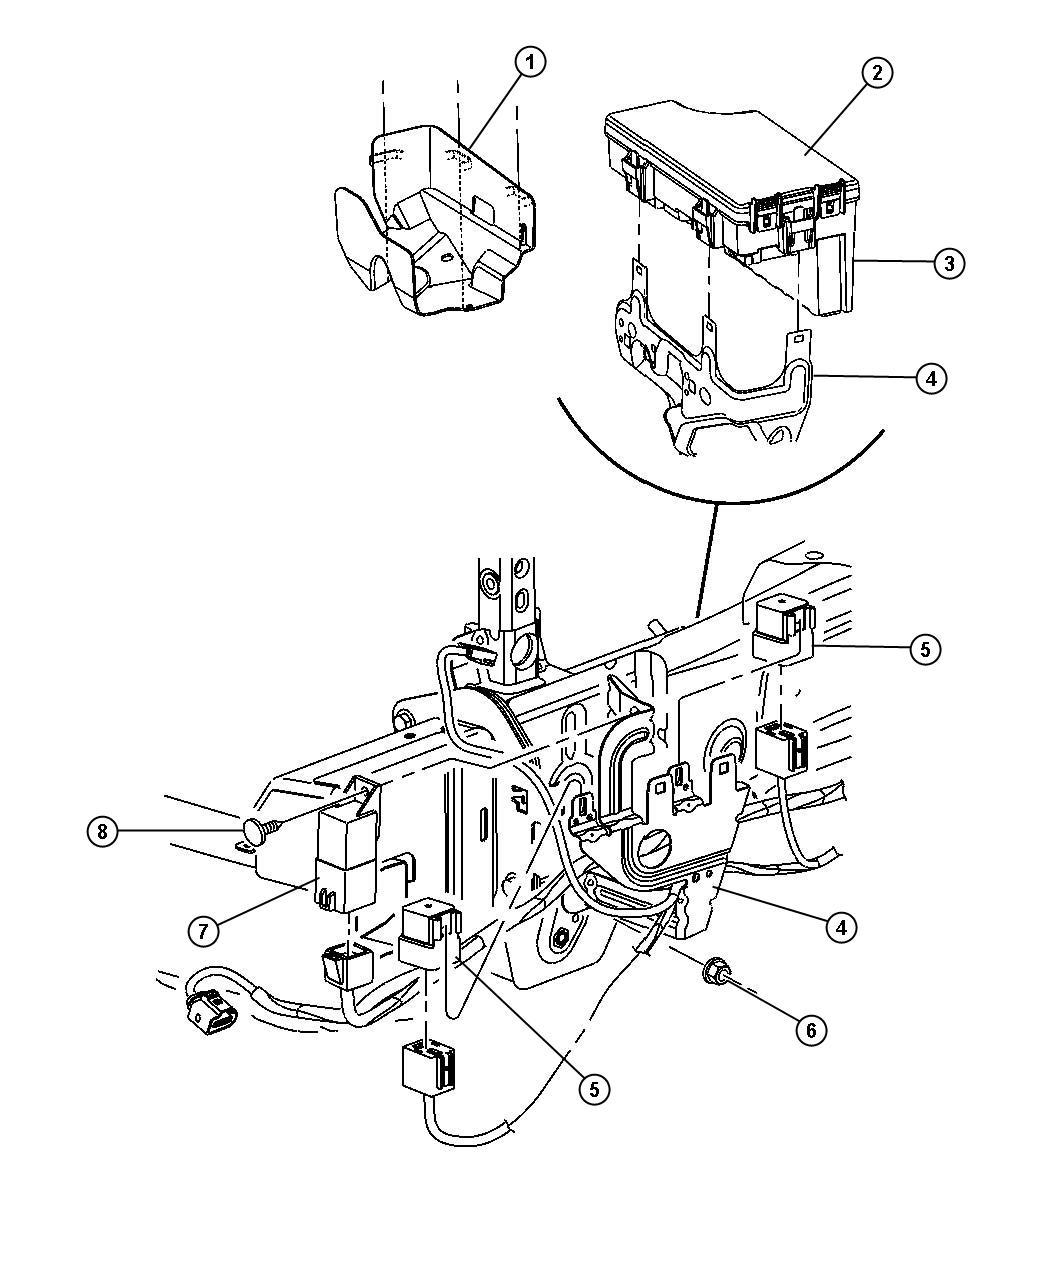 Dodge nitro fuse box 15 dodge nitro head